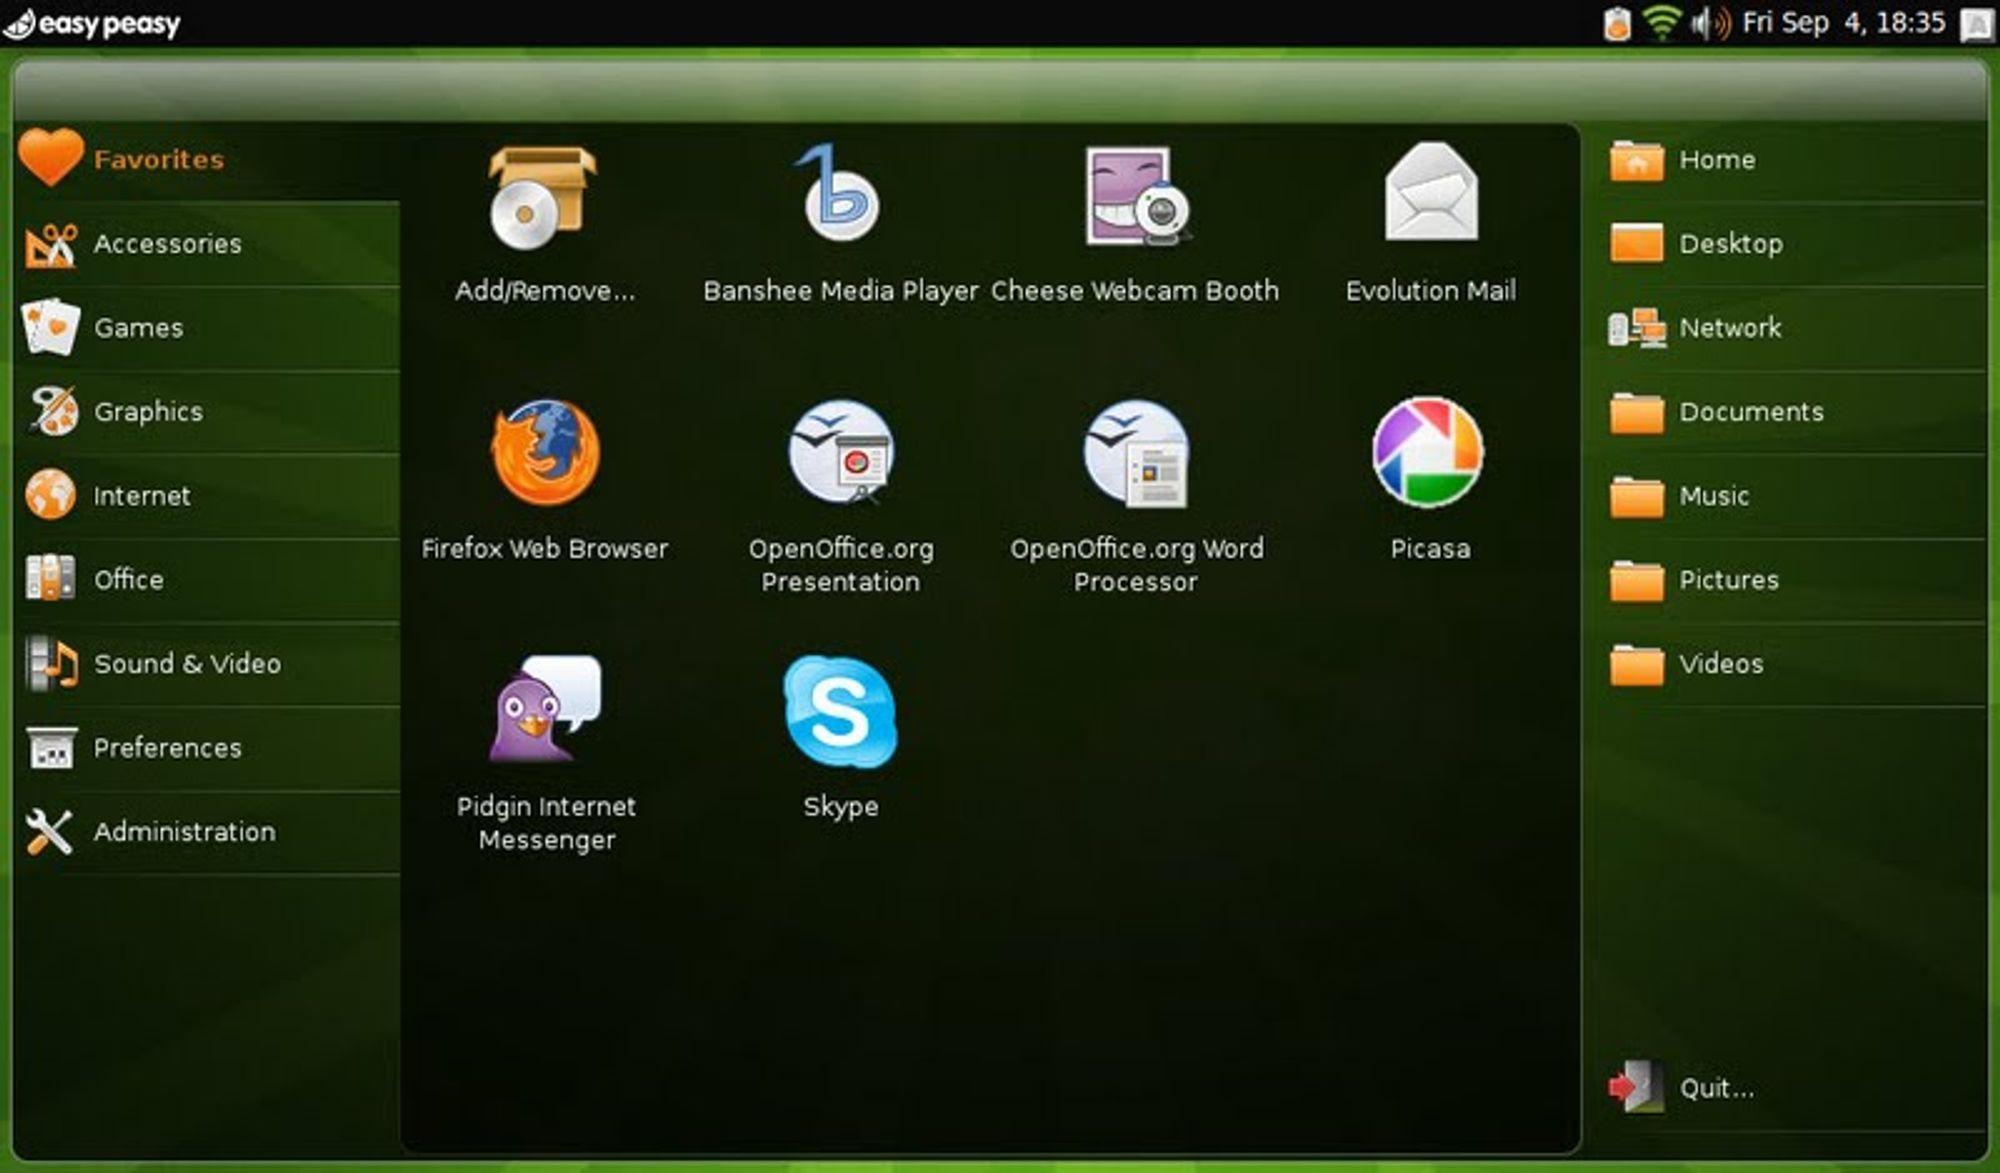 Linux spilleautomater – På Ubuntu og andre distribusjoner